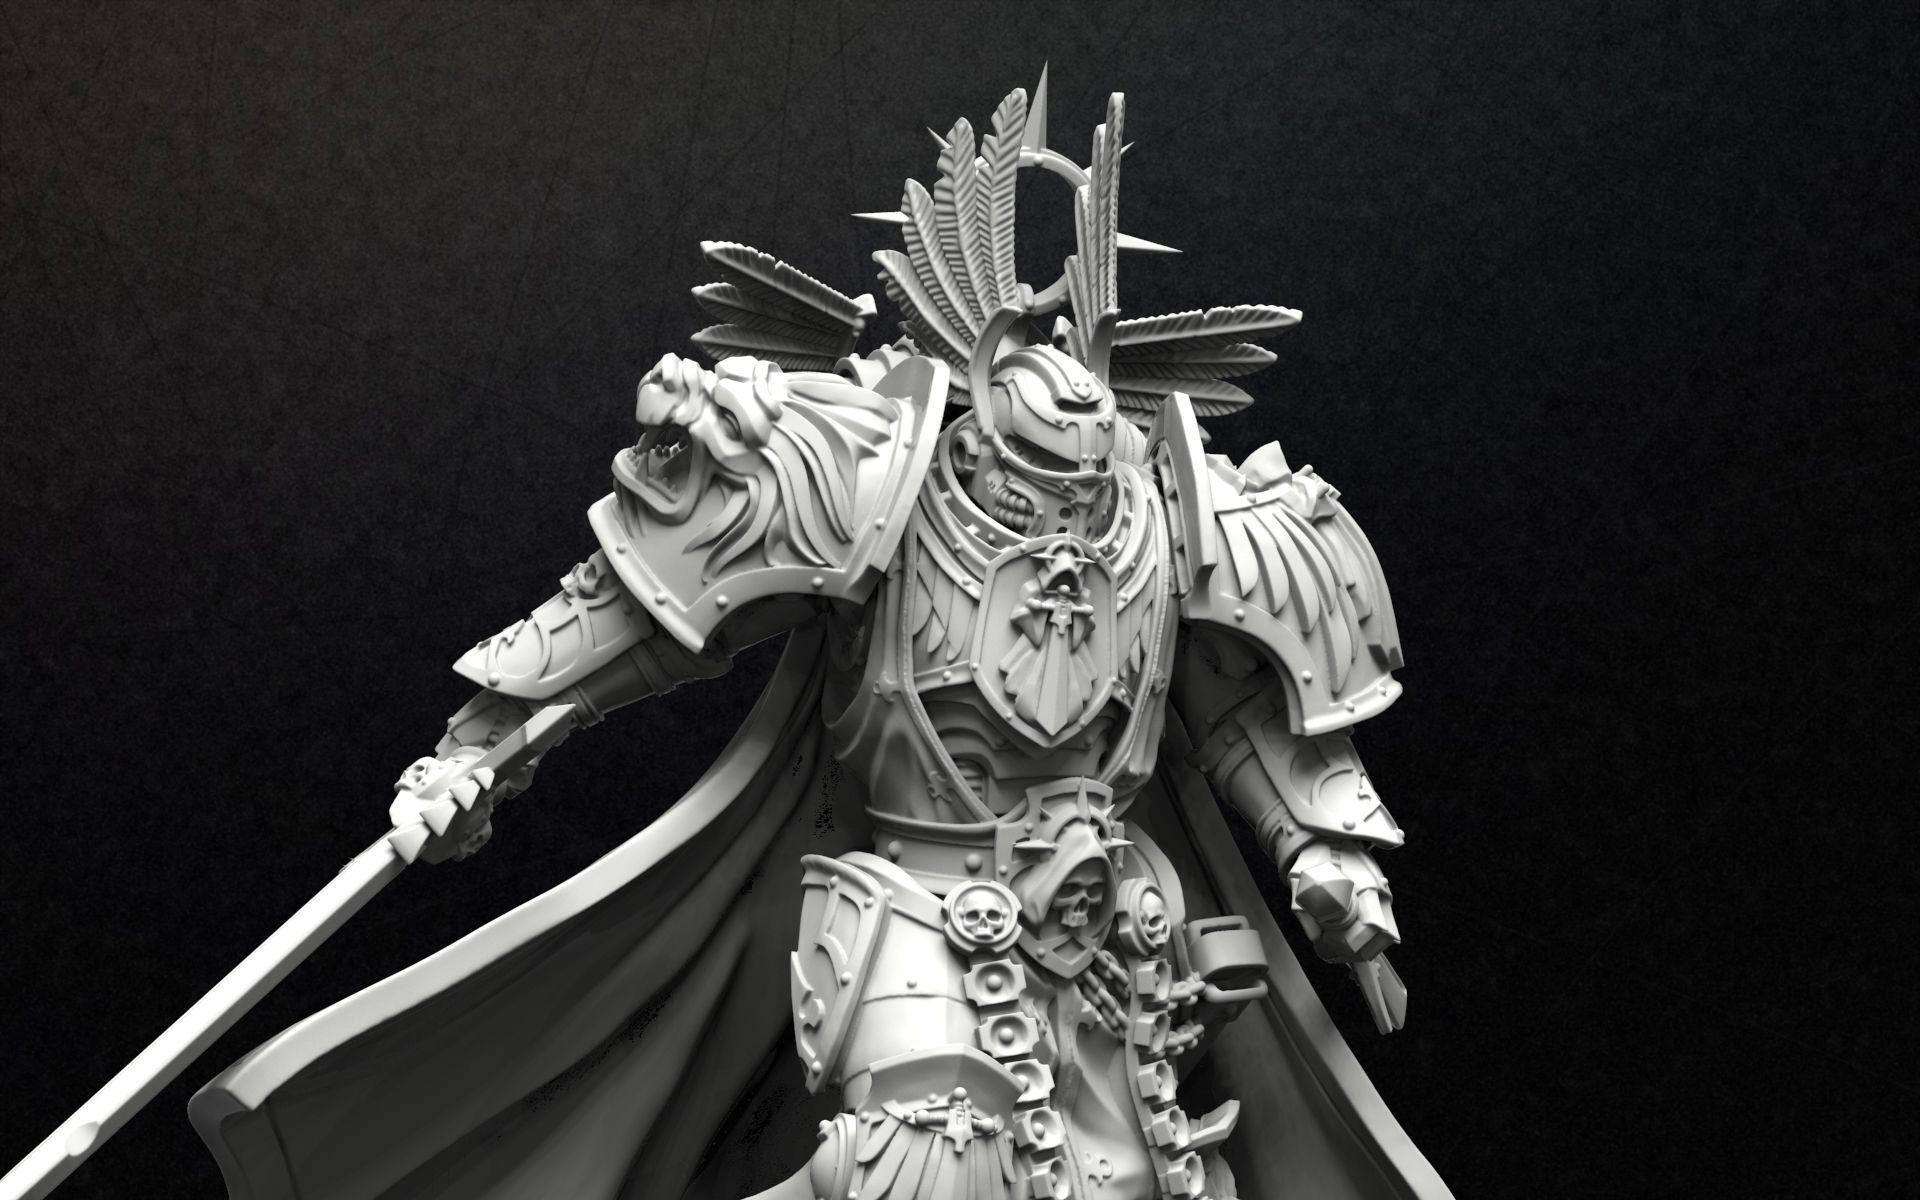 The Beast Slayer Knight